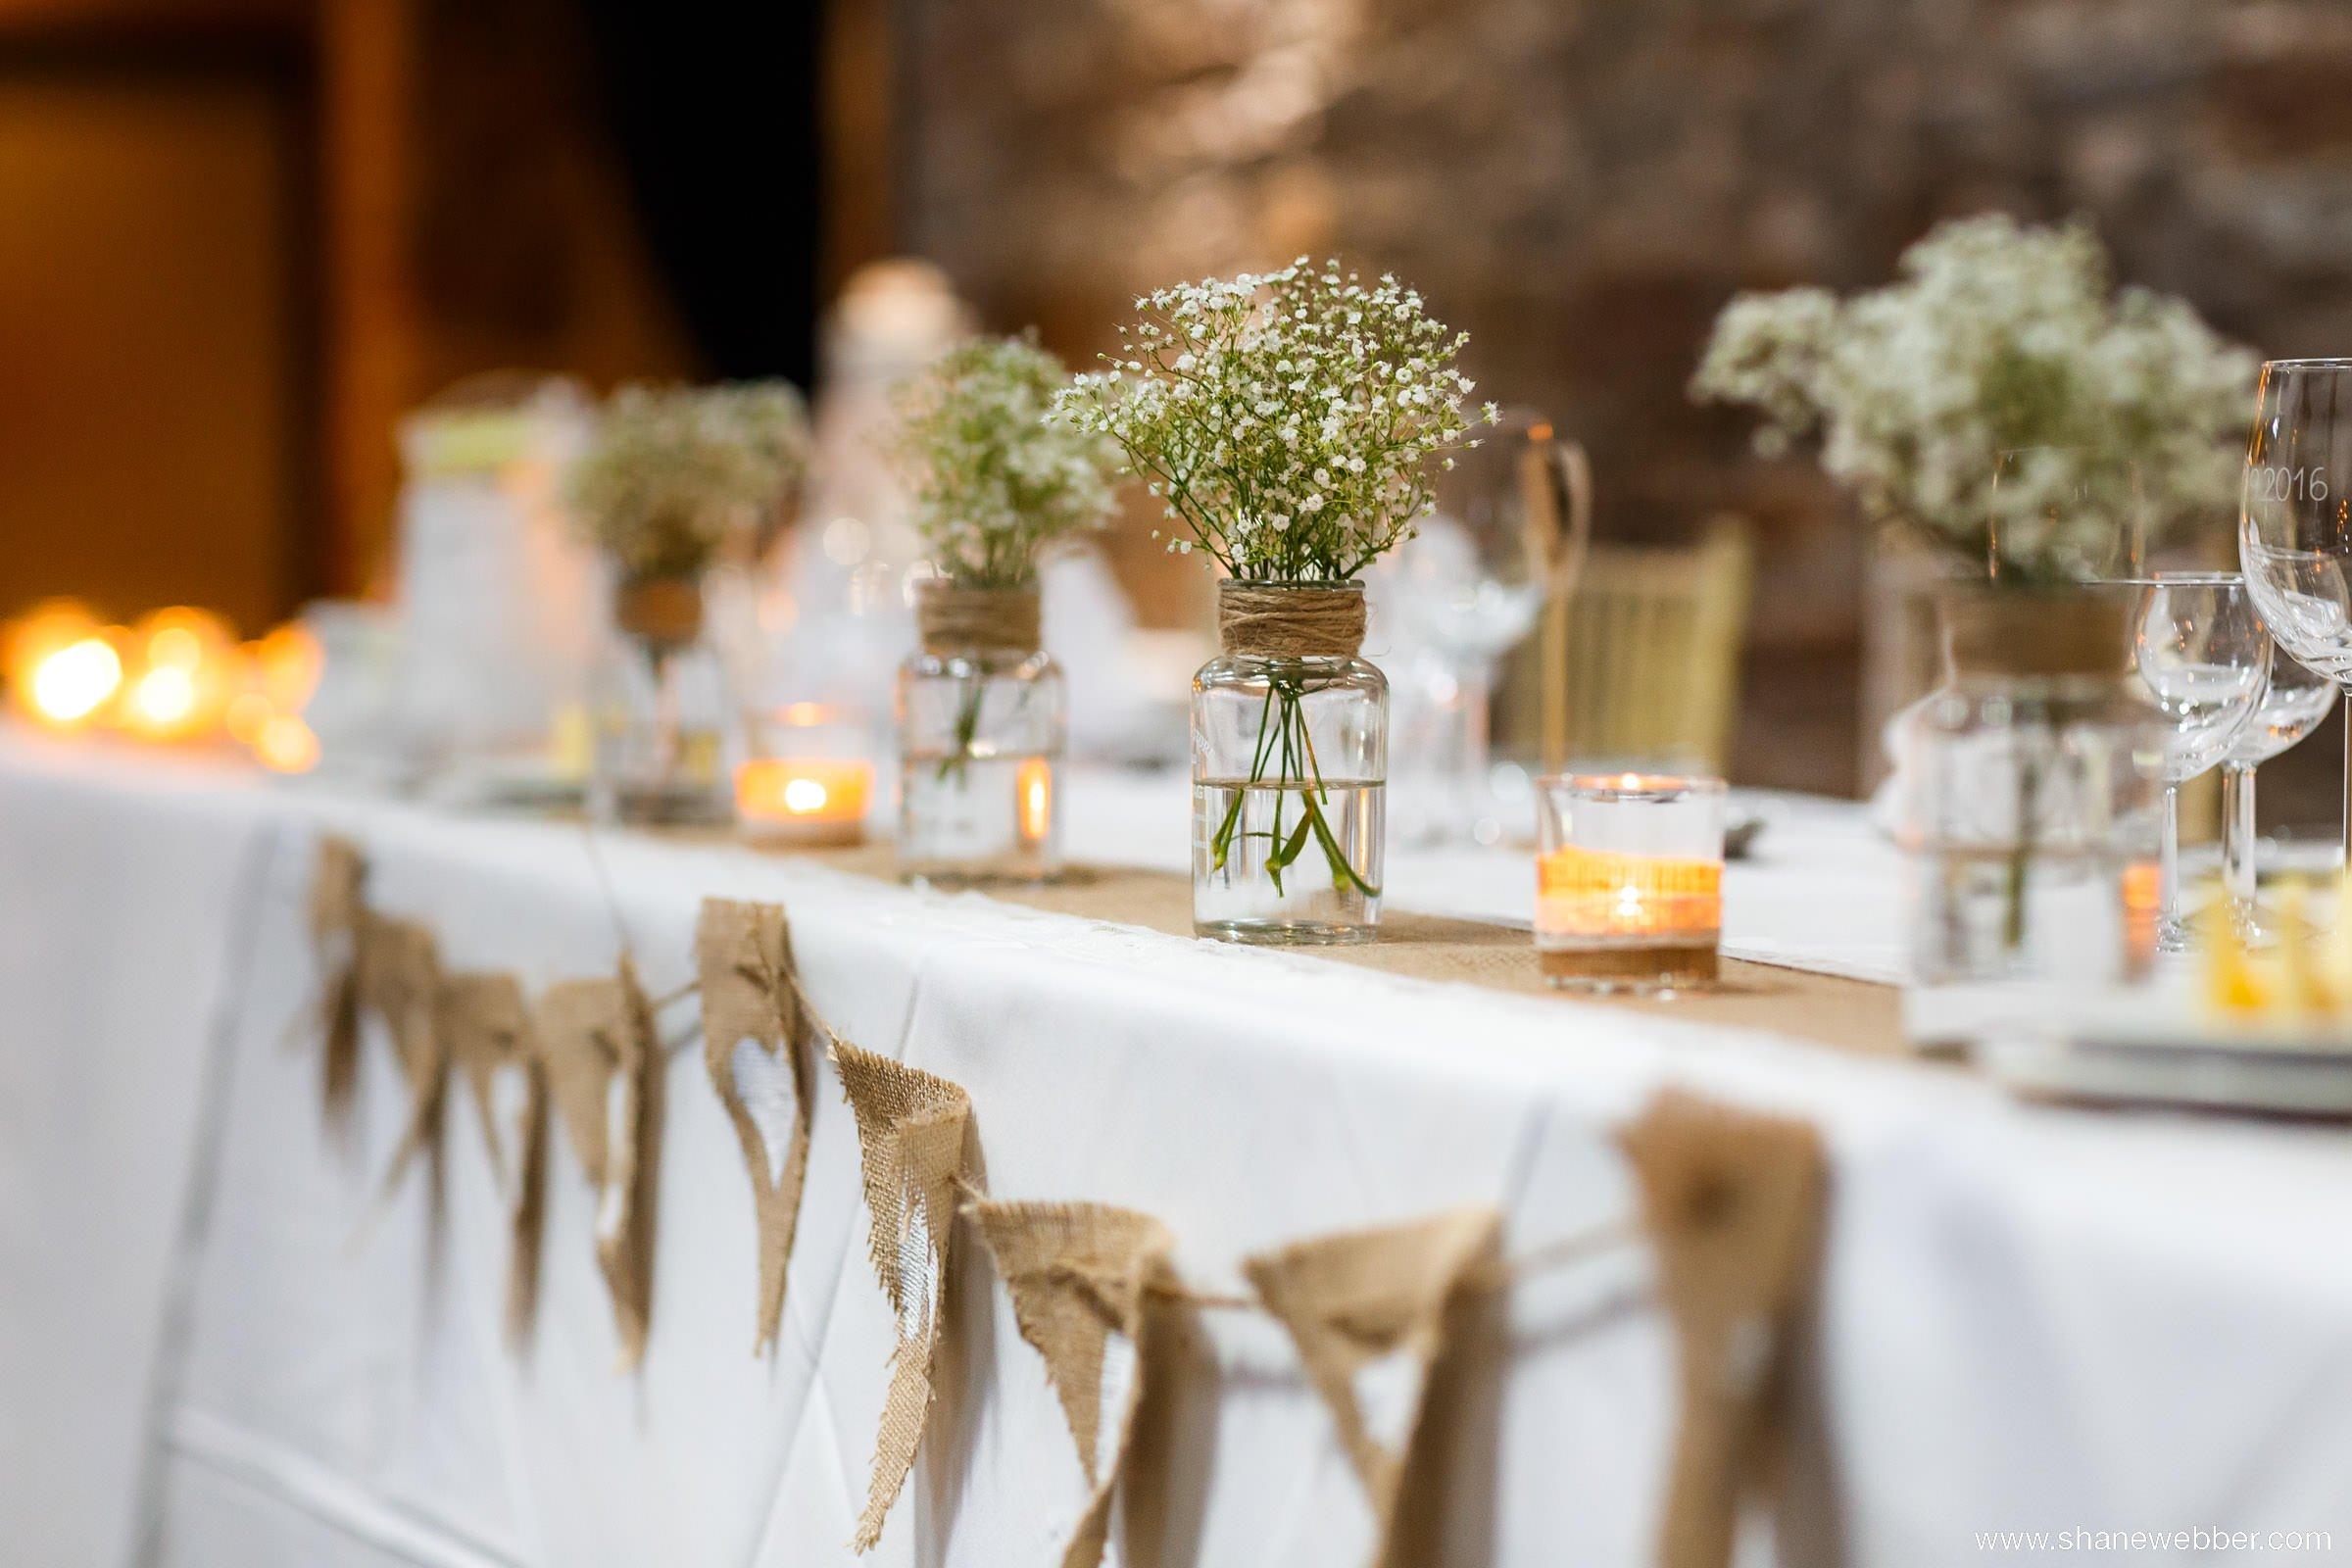 Lancashire manor hotel wedding photography lancashire manor hotel wedding photography wedding details and decorations diy wedding decorations junglespirit Image collections